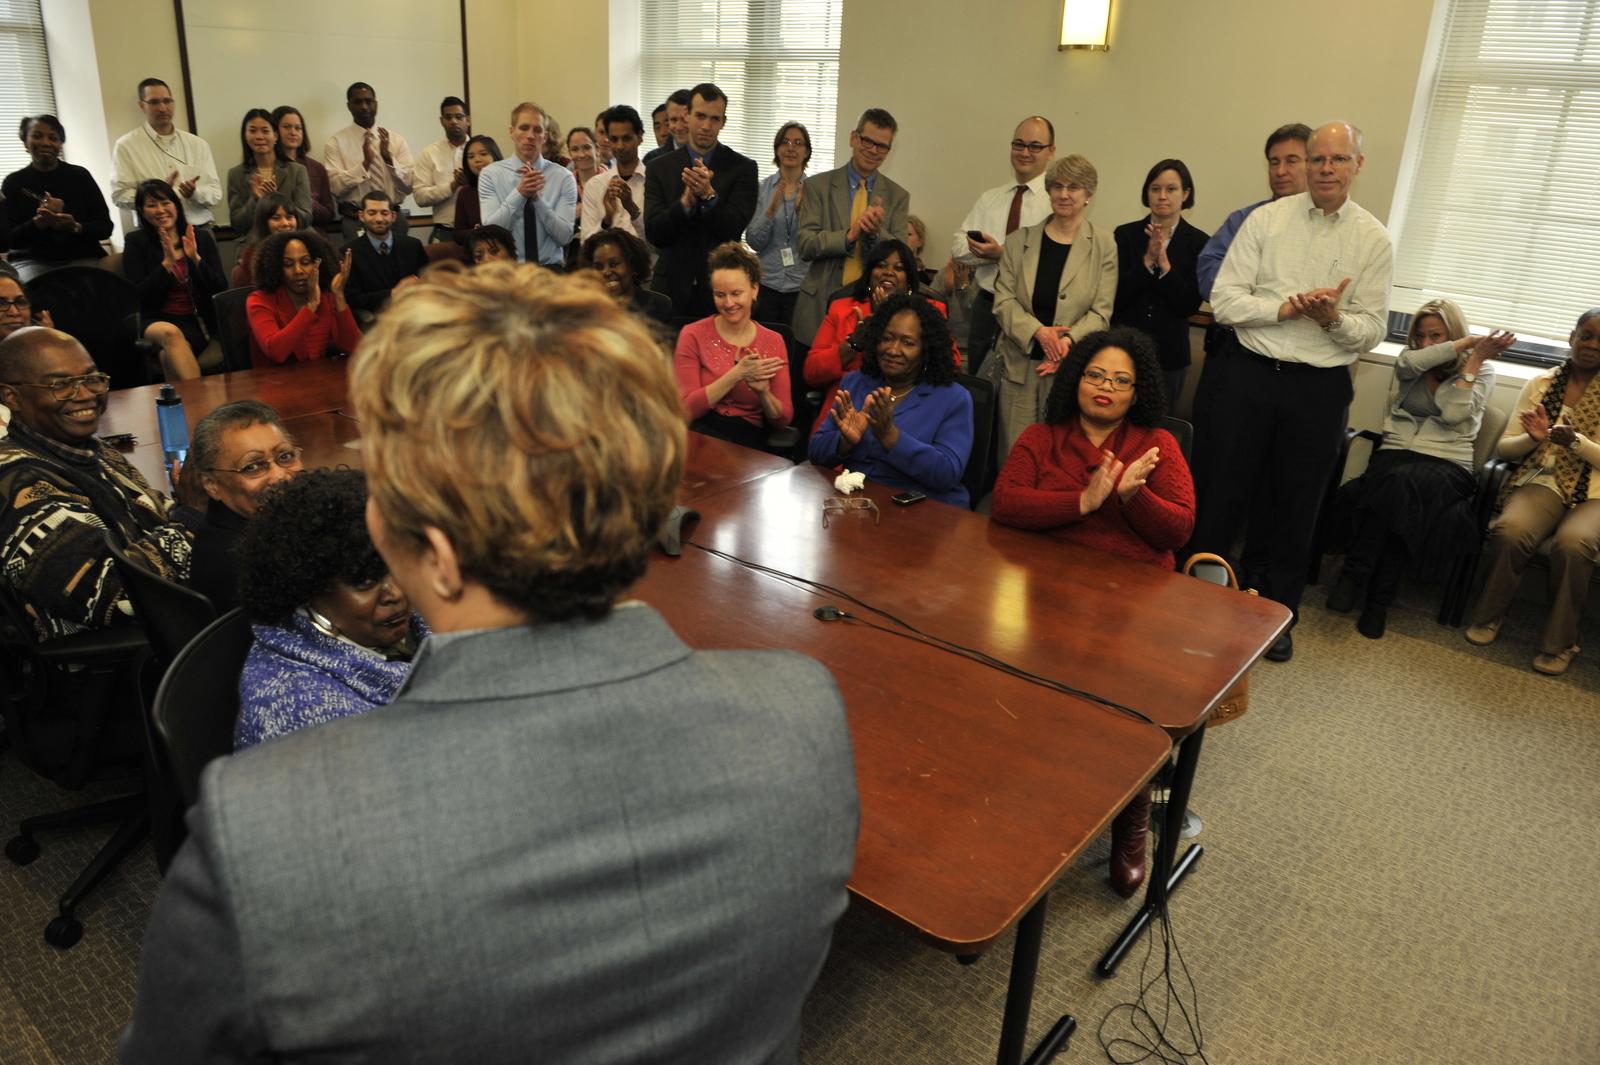 Office of the Administrator - Lisa Jackson's Farewell Tour [412-APD-1115-2013-02-07_FarewellTour_179.JPG]